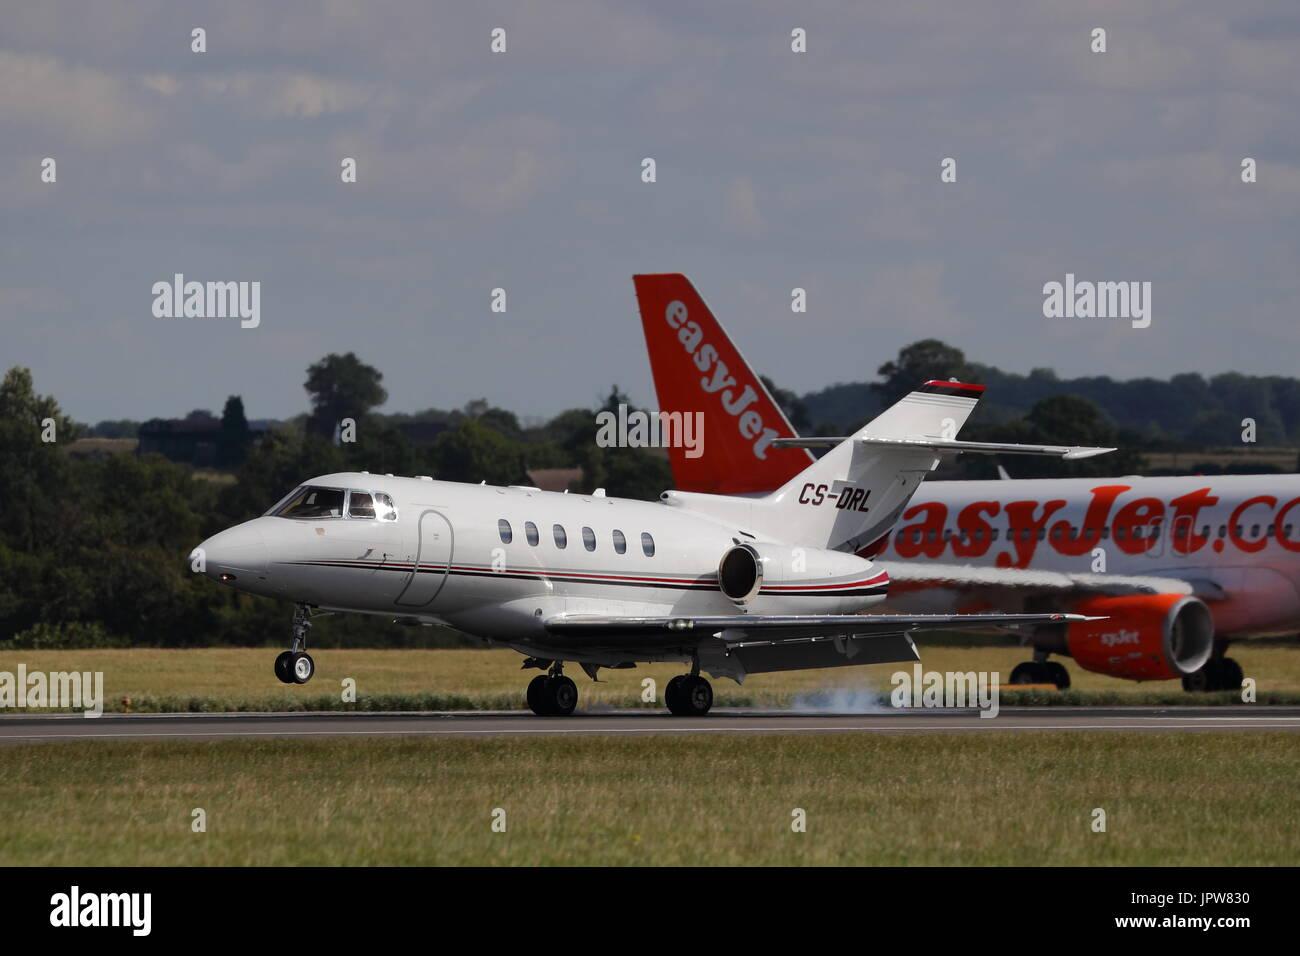 Raytheon Hawker 800XP CS-DRL business jet landing at London Luton Airport, UK - Stock Image